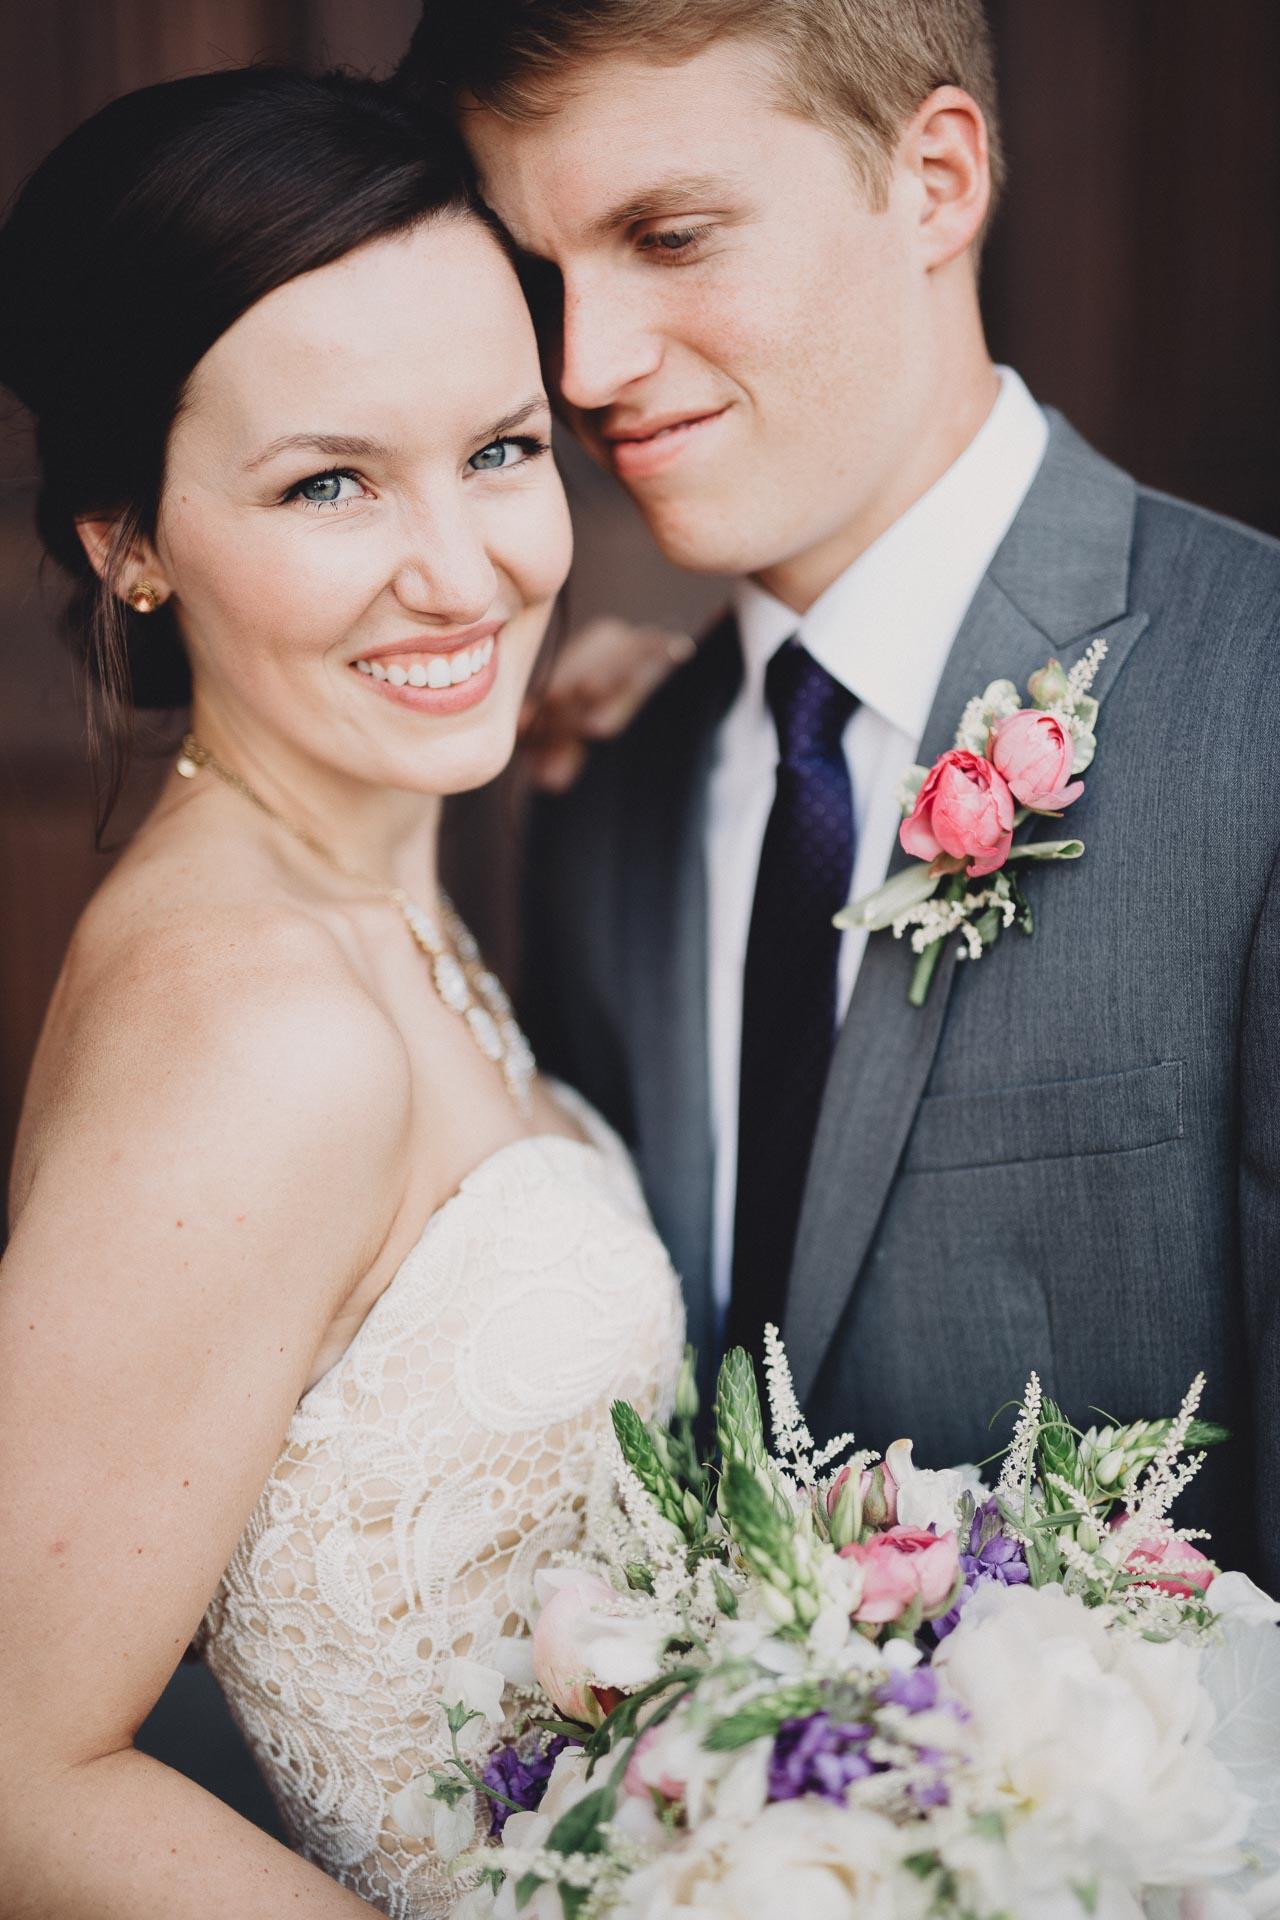 Julia-Michael-Cincinnati-Music-Hall-Wedding-079@2x.jpg